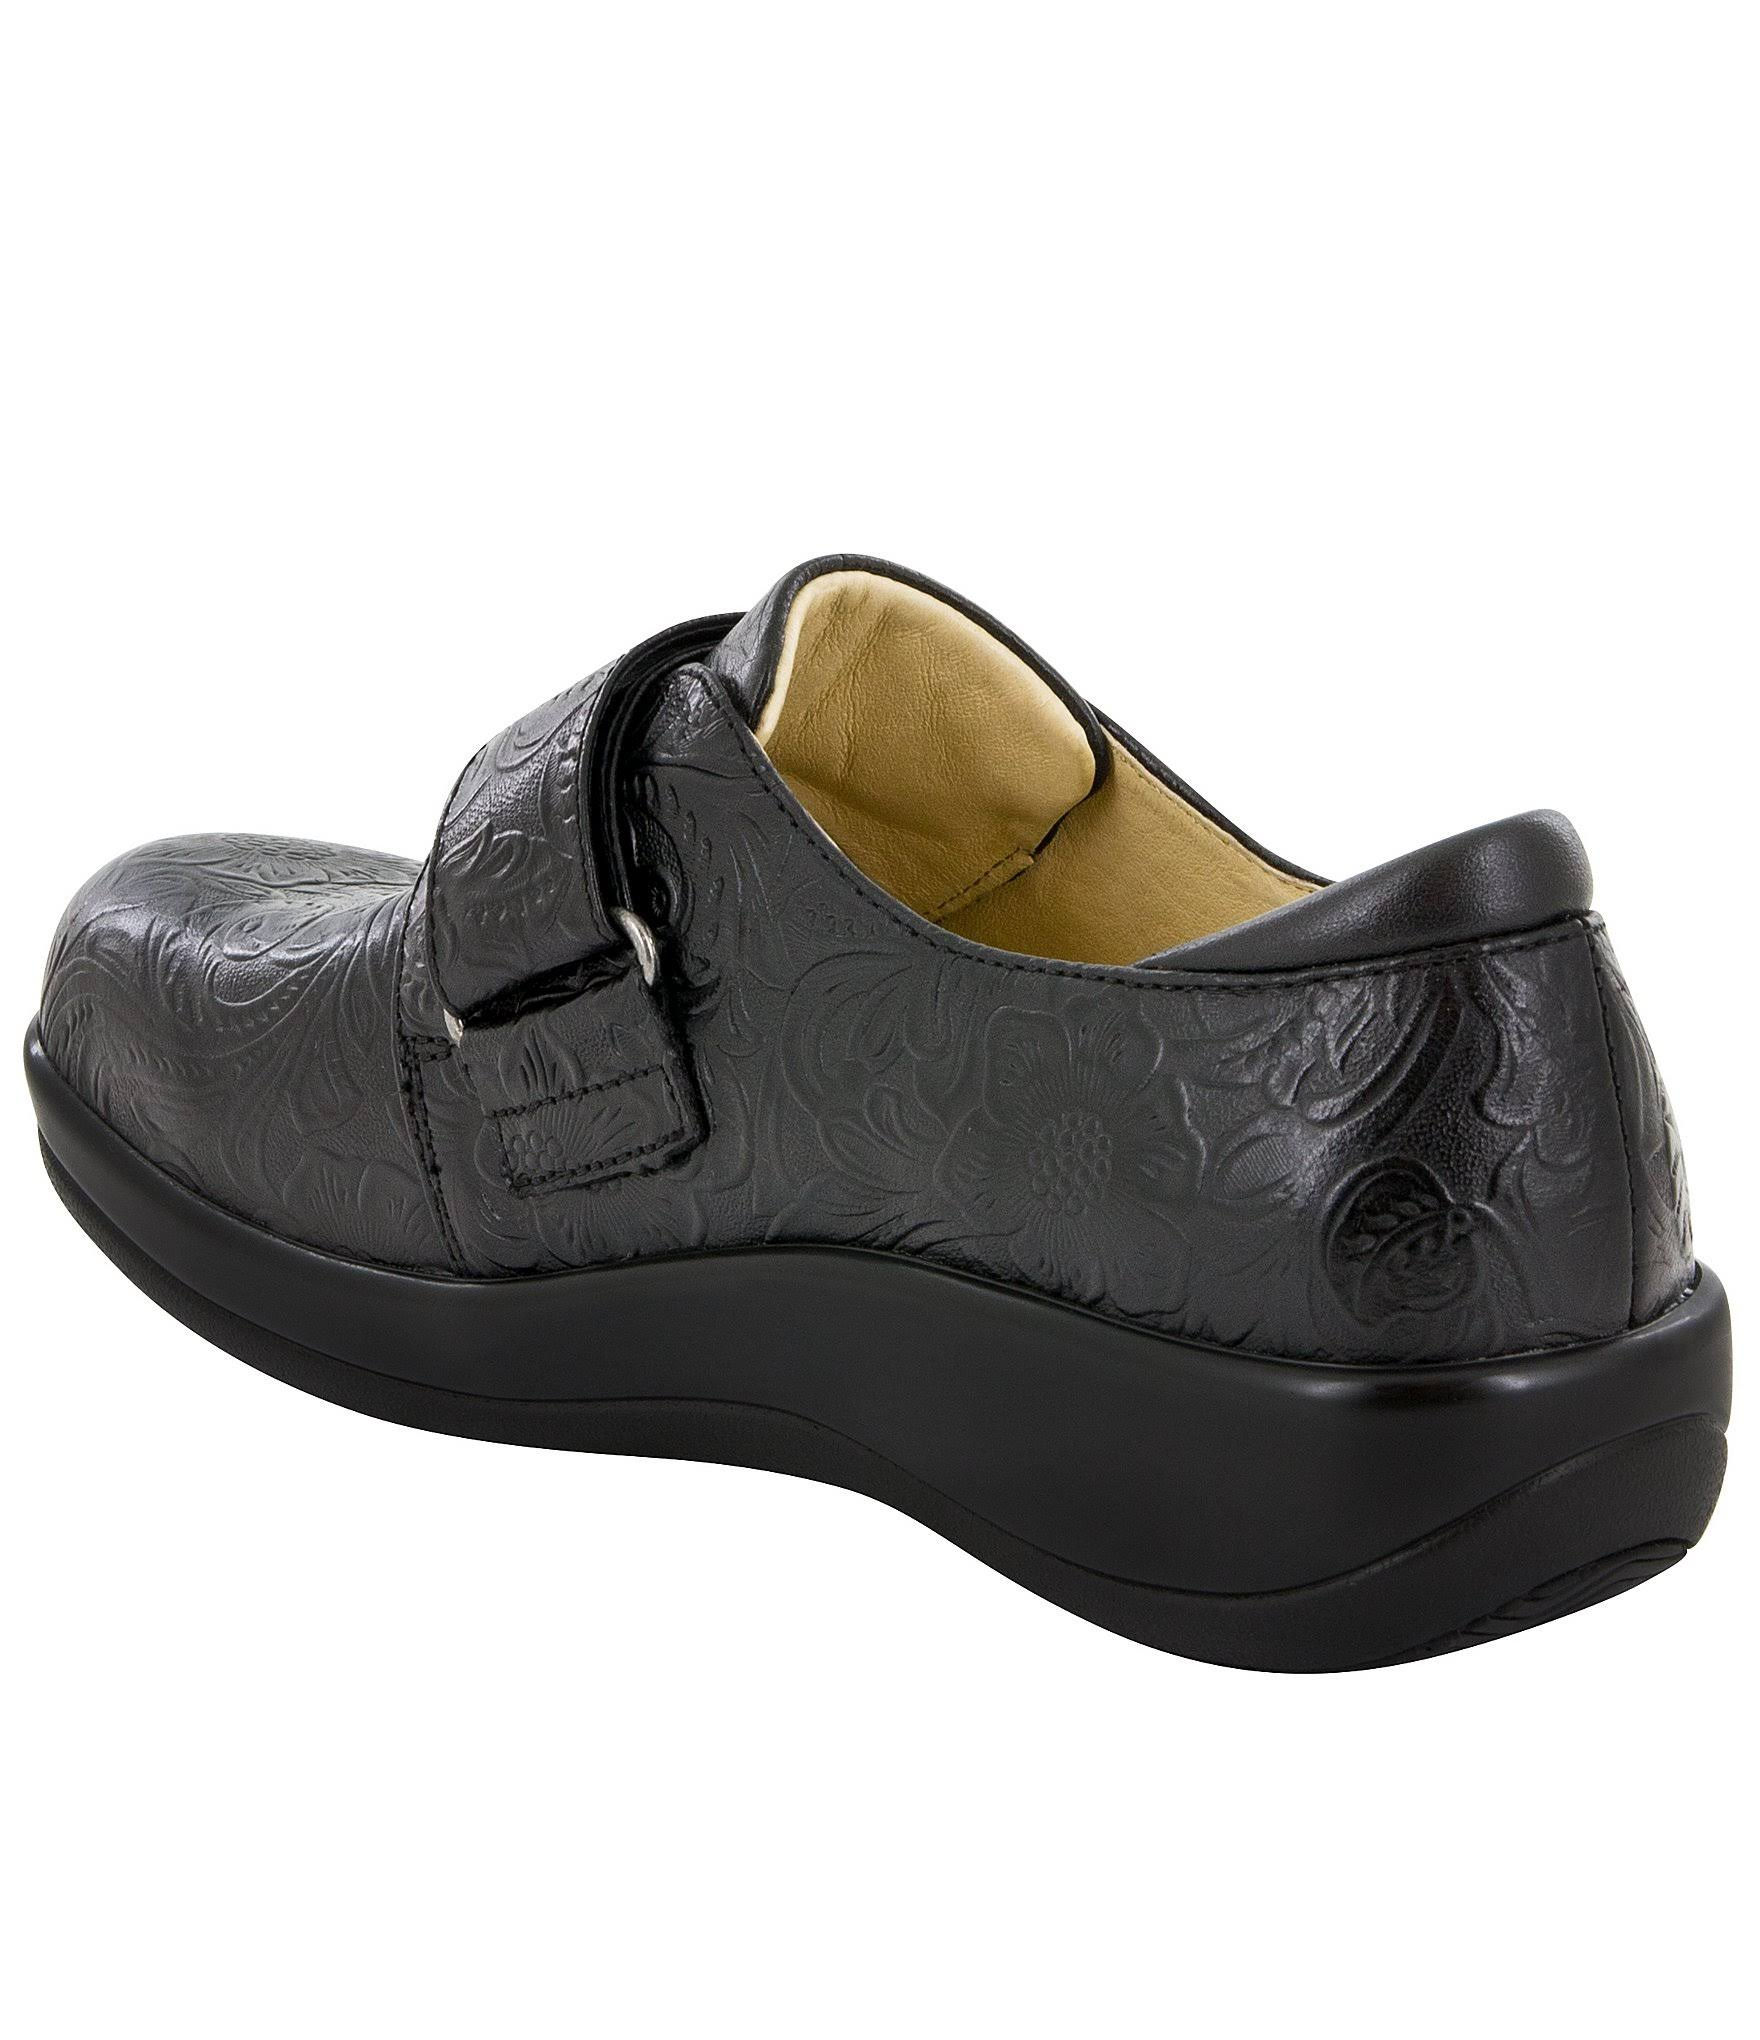 Joleen Tar Tooled Shoe 39Nero Alegria 8n0kXOPw